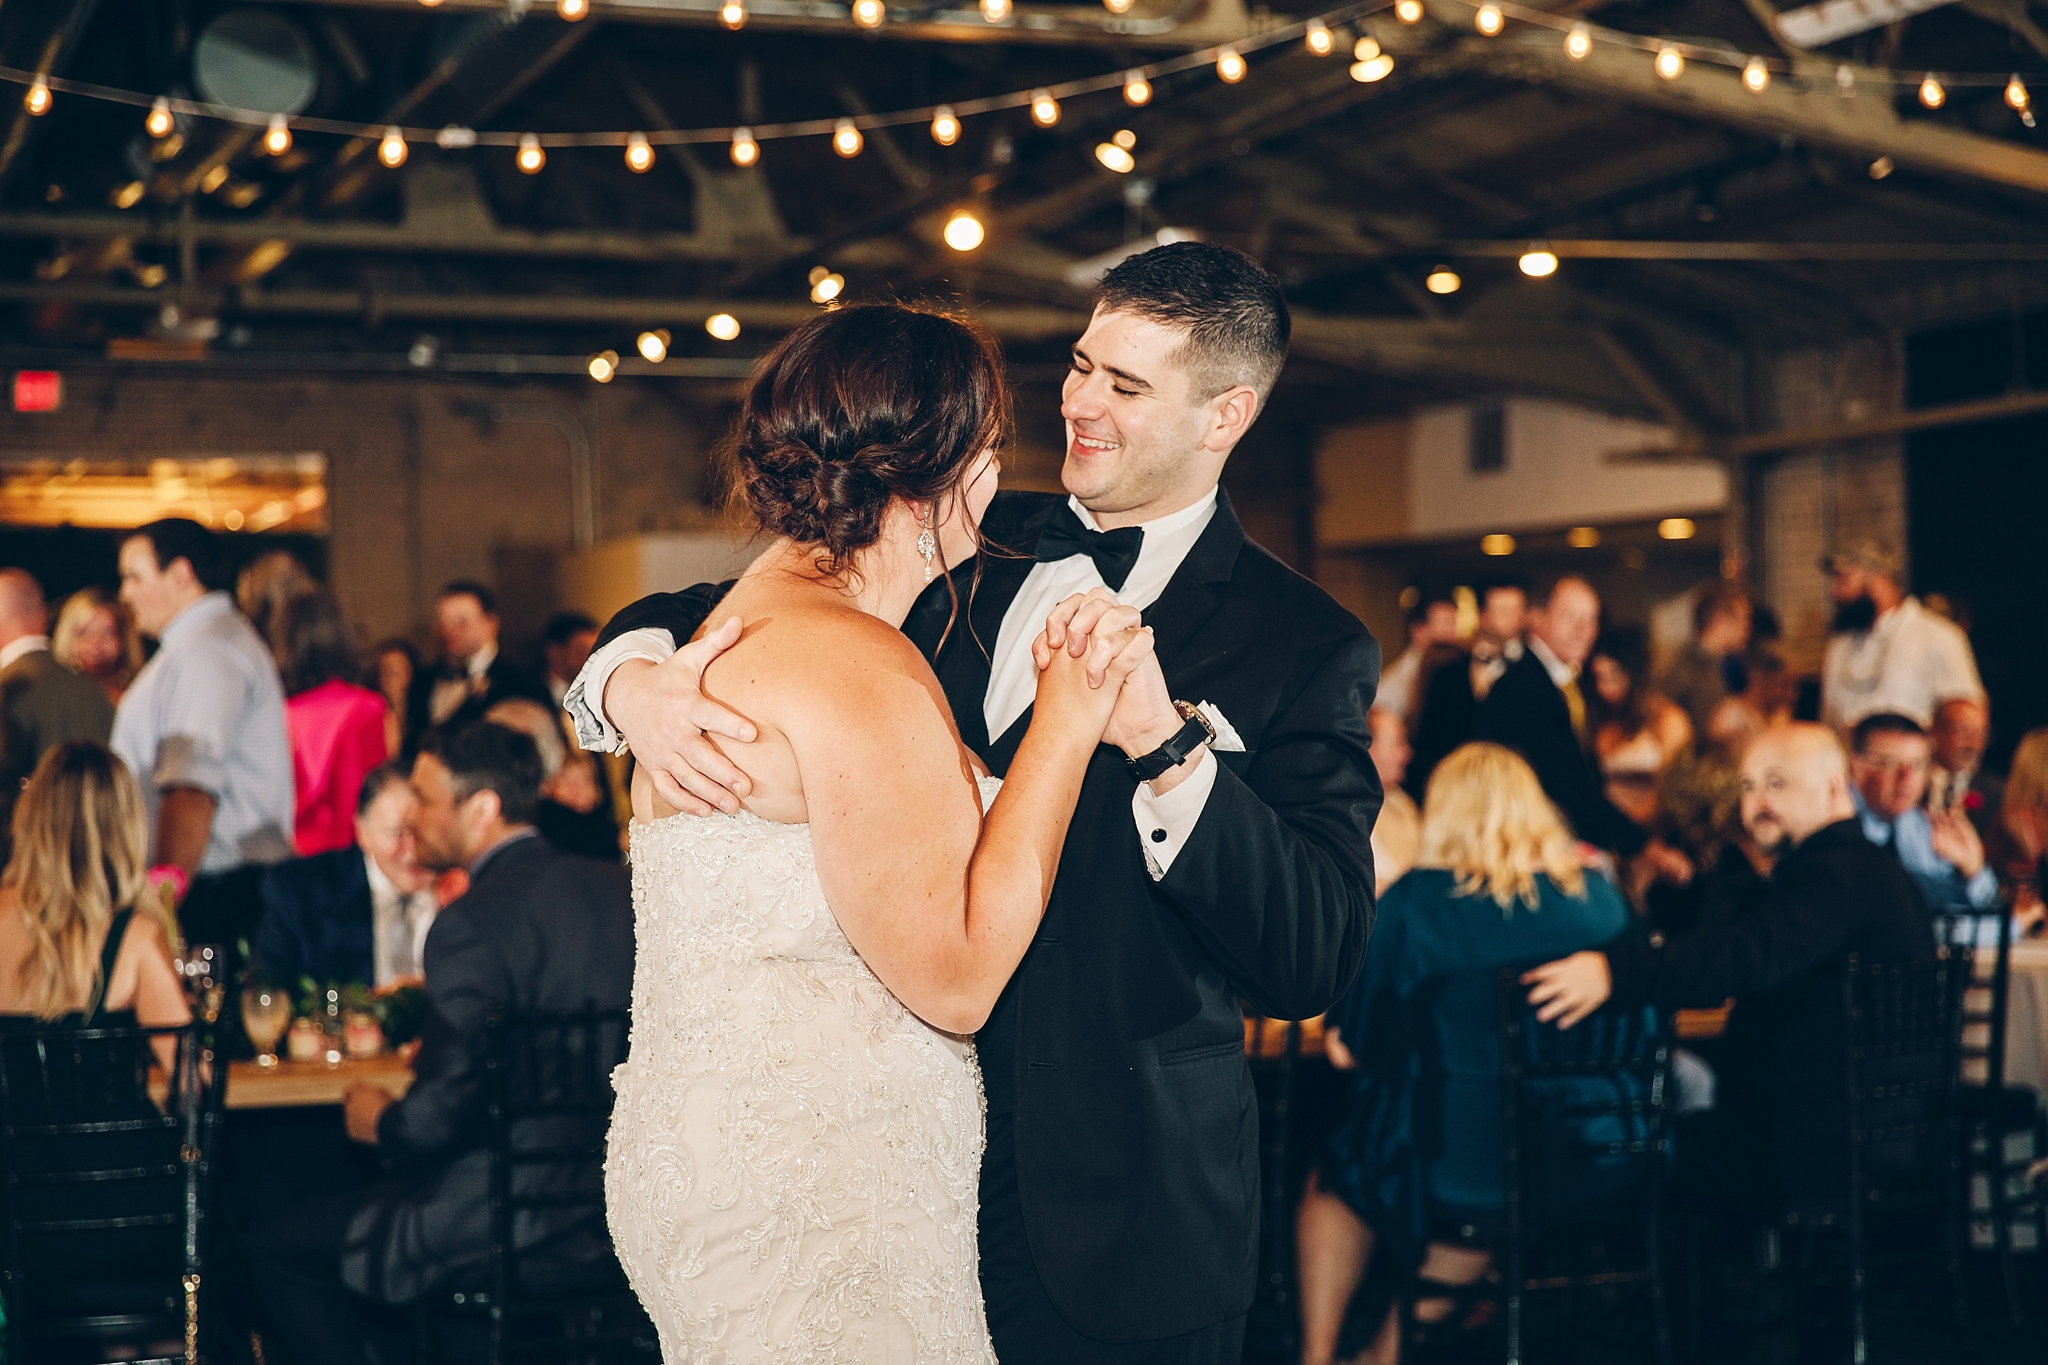 baker-lofts-holland-michigan-wedding-photographer_0394.jpg